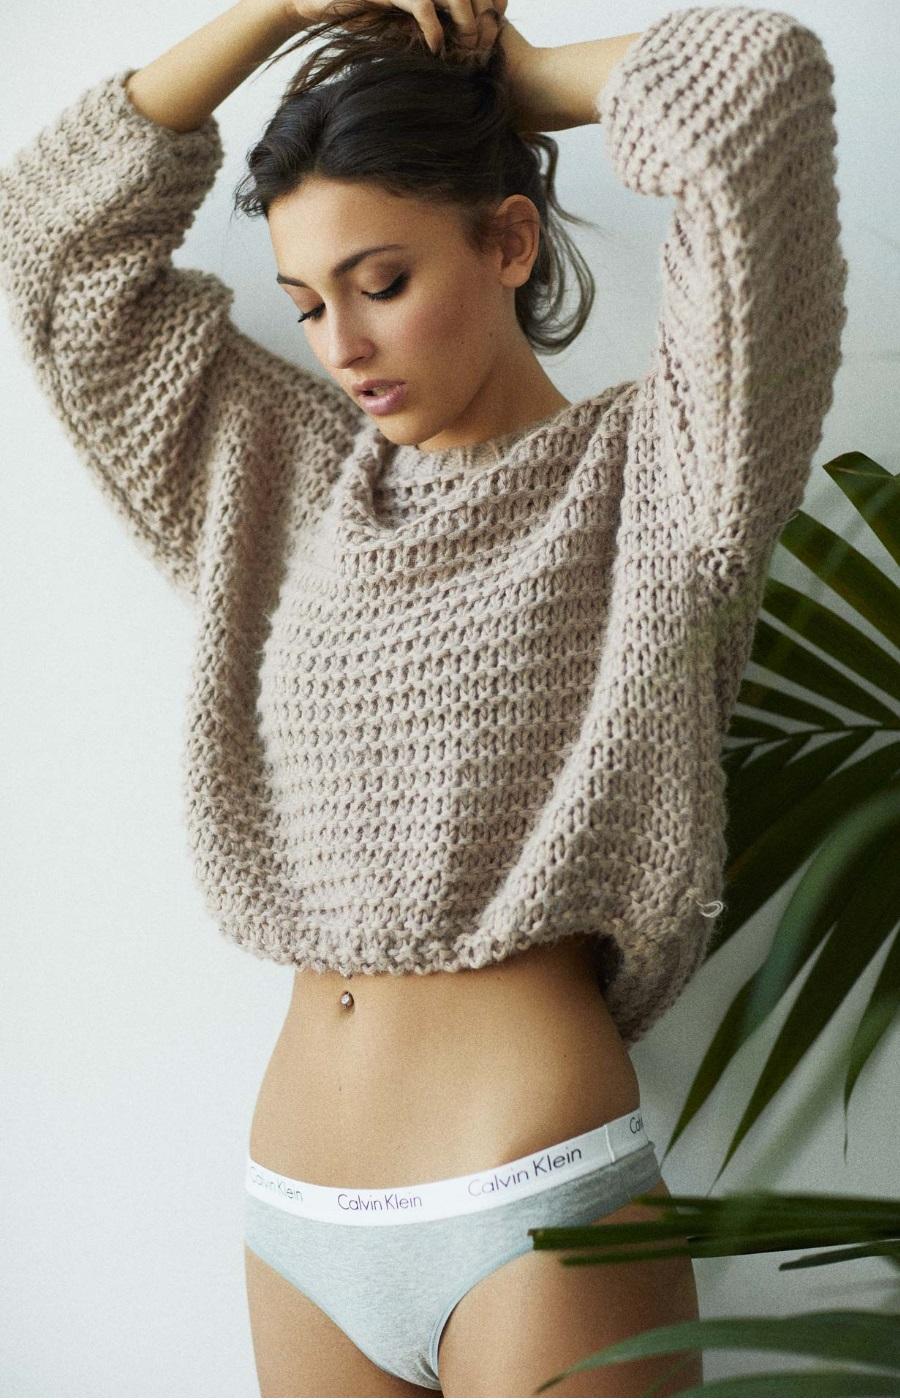 erika albonetti in sweater and underwear